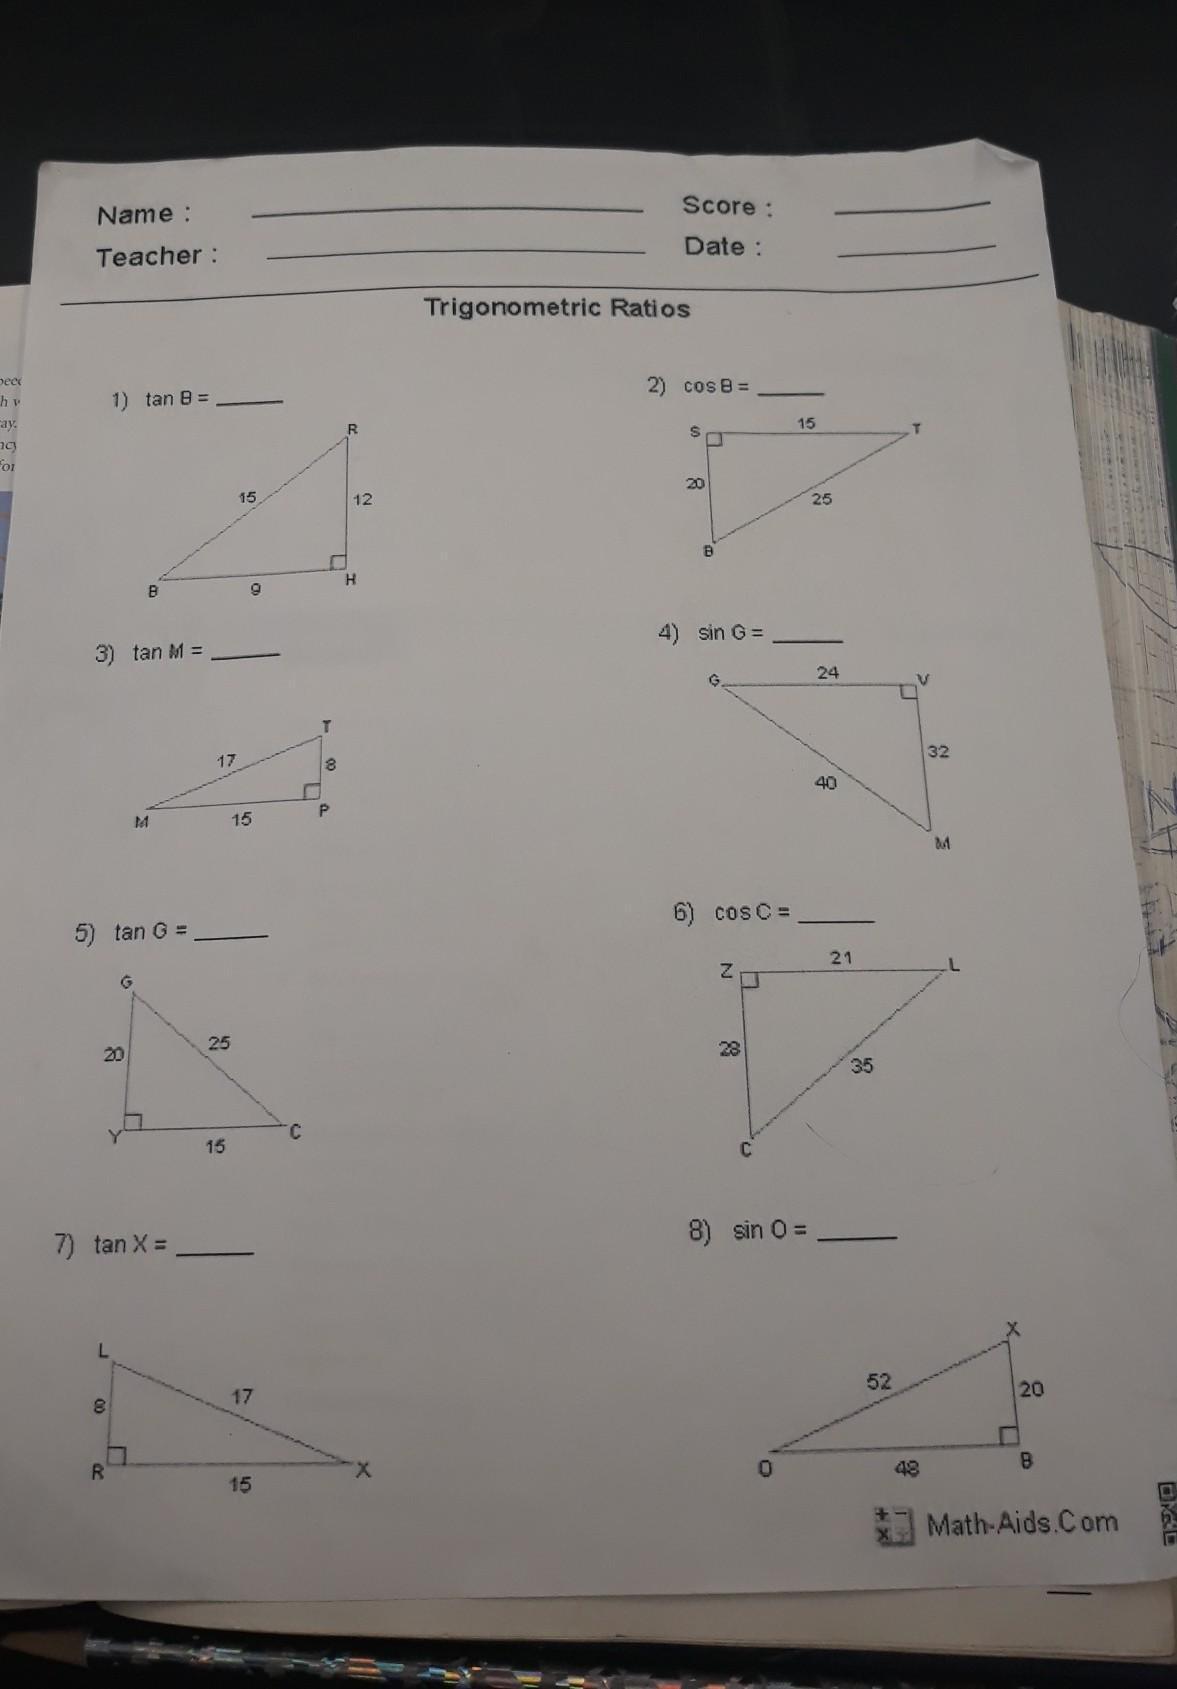 Trigonometric Ratios Worksheet Answers